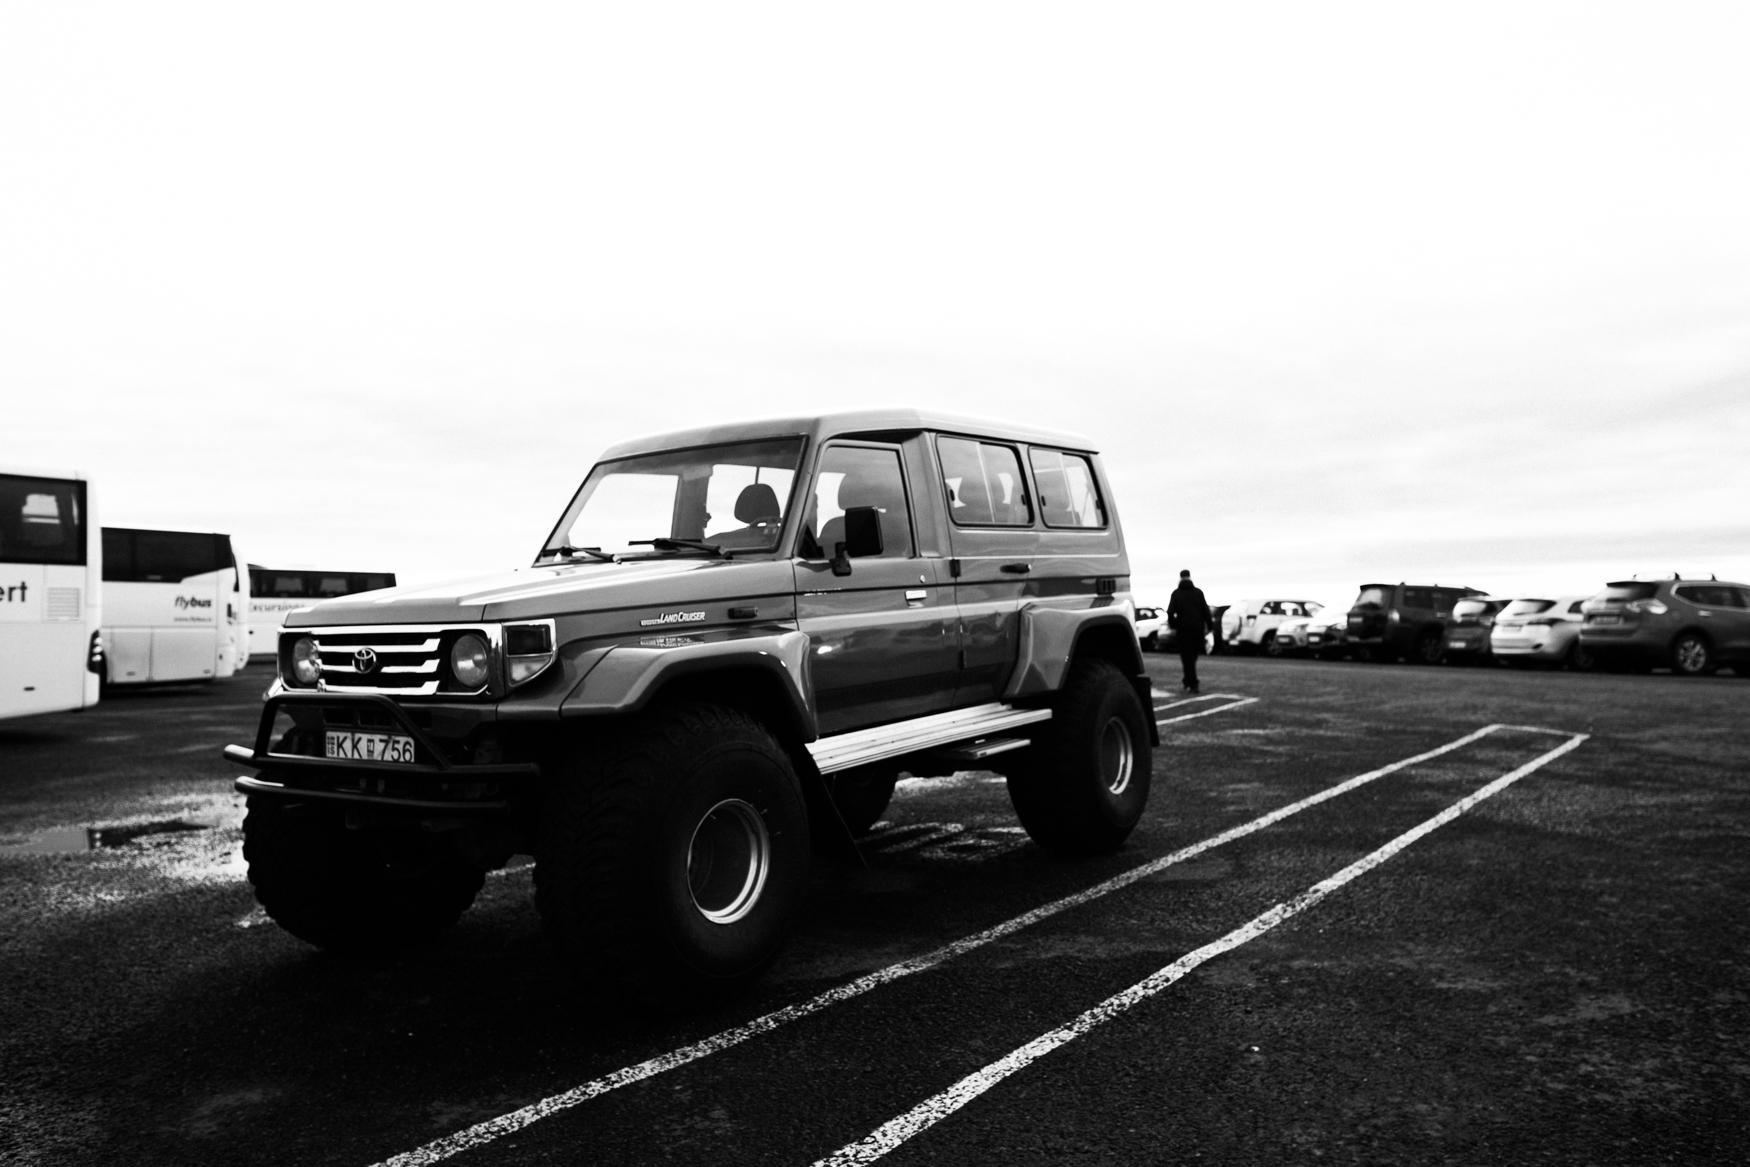 Alex_Sedgmond_Iceland-61.JPG